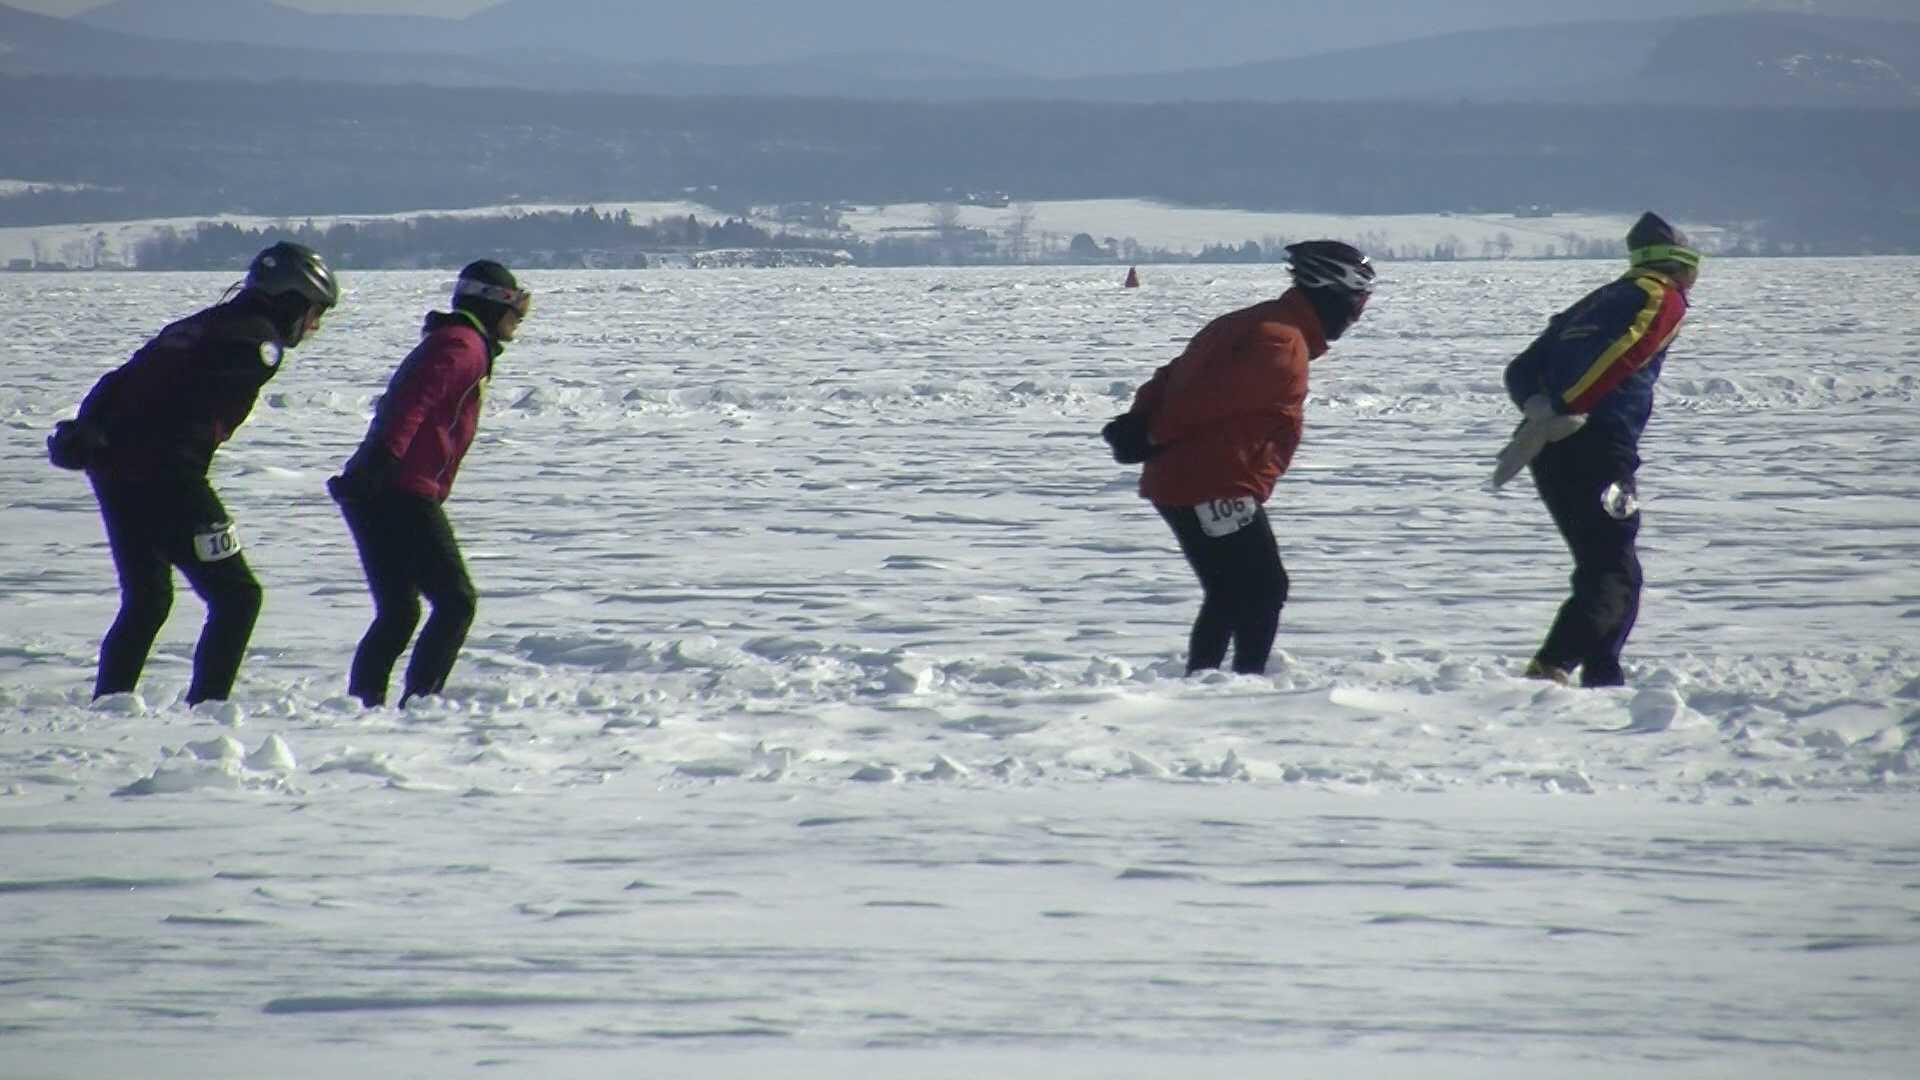 021013 Skaters take to frozen Lake Champlain - img